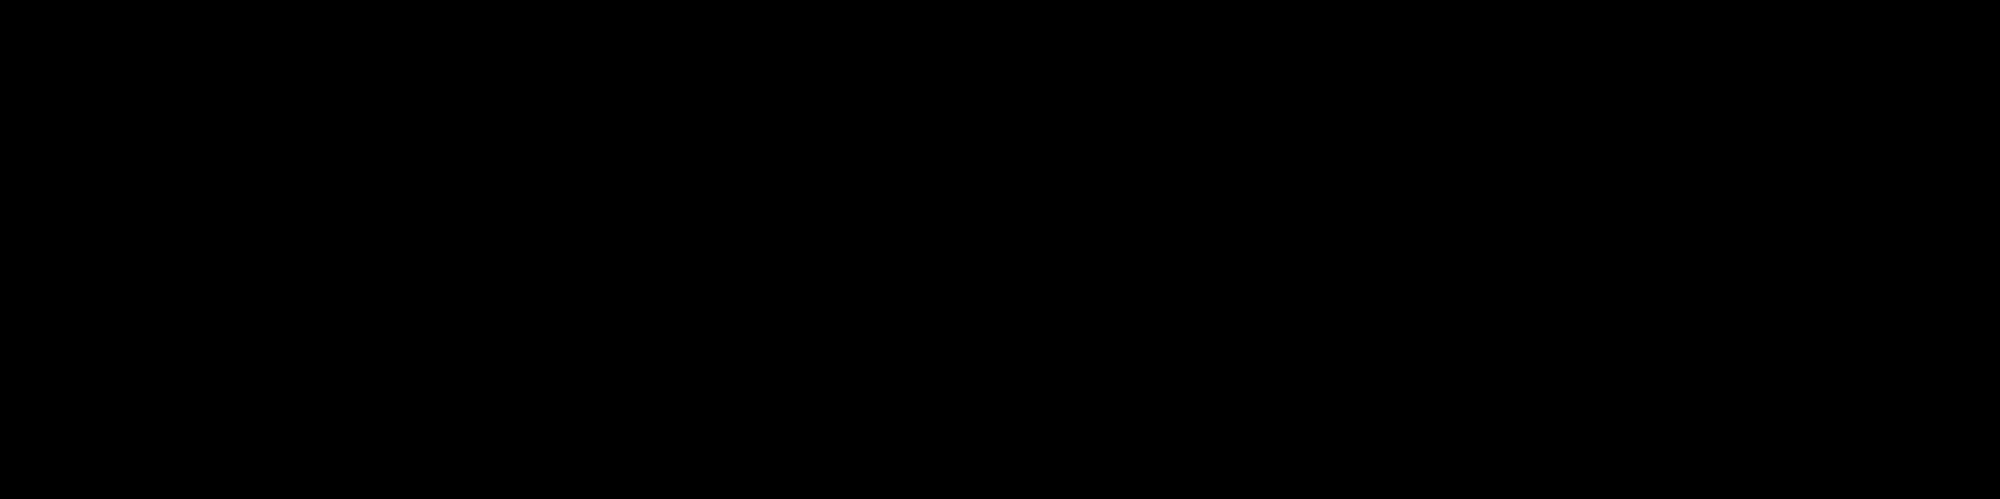 ANNA LUNDGAARD-logo-black.png